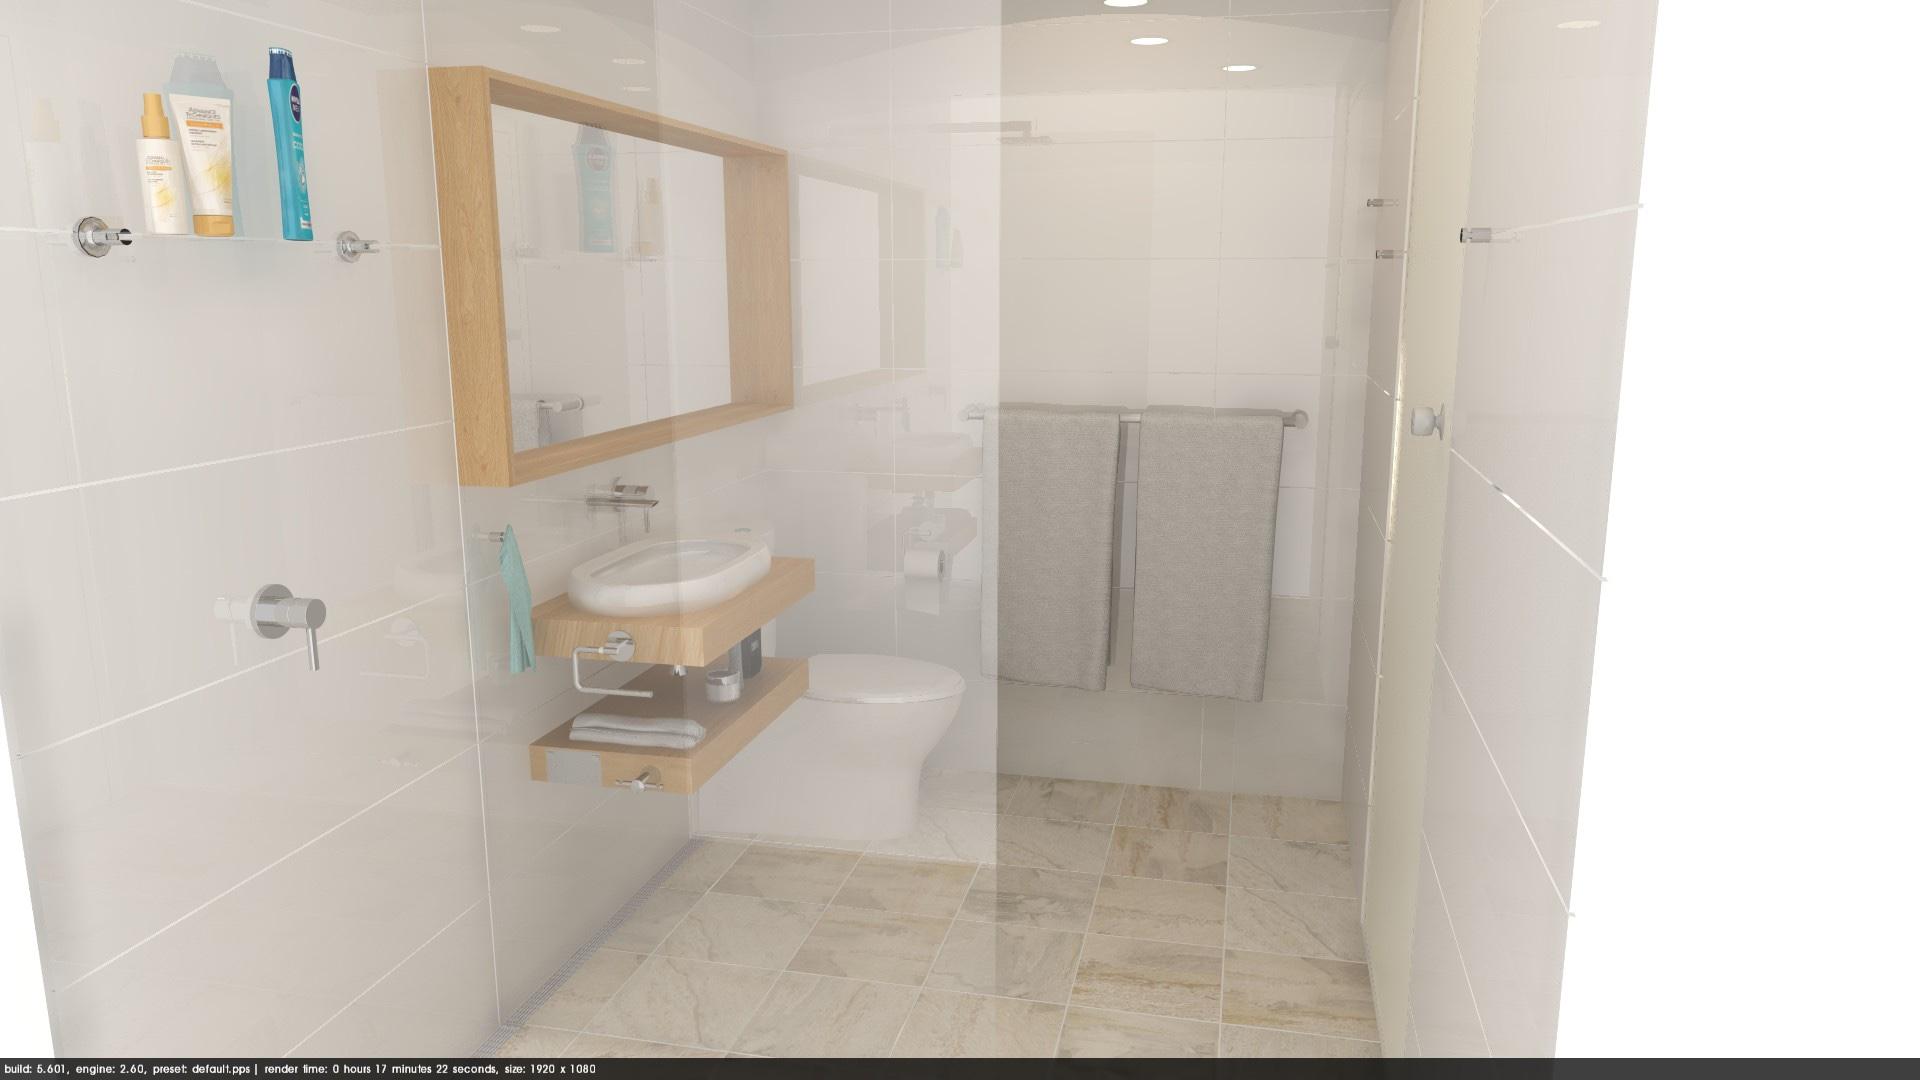 Noahs - bathroom - Premier 2017-08-28 20061000000.jpg